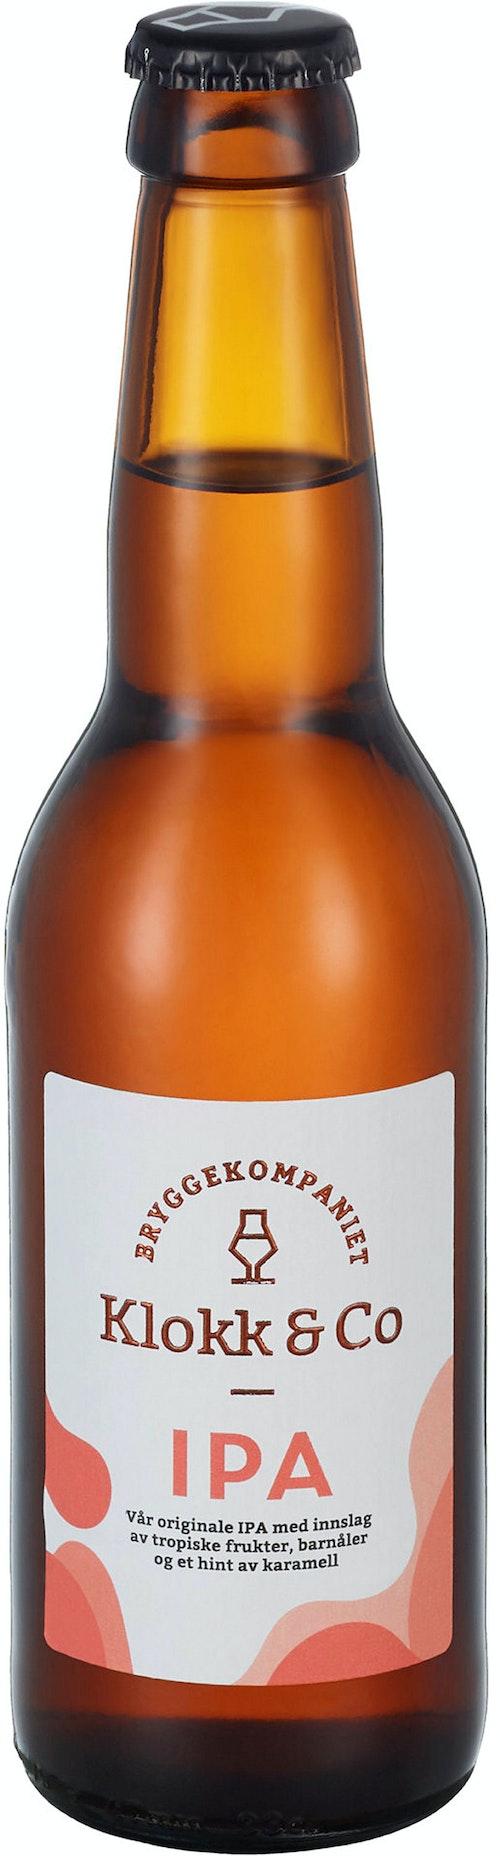 Klokk & Co IPA 4,5%, 0,33 l